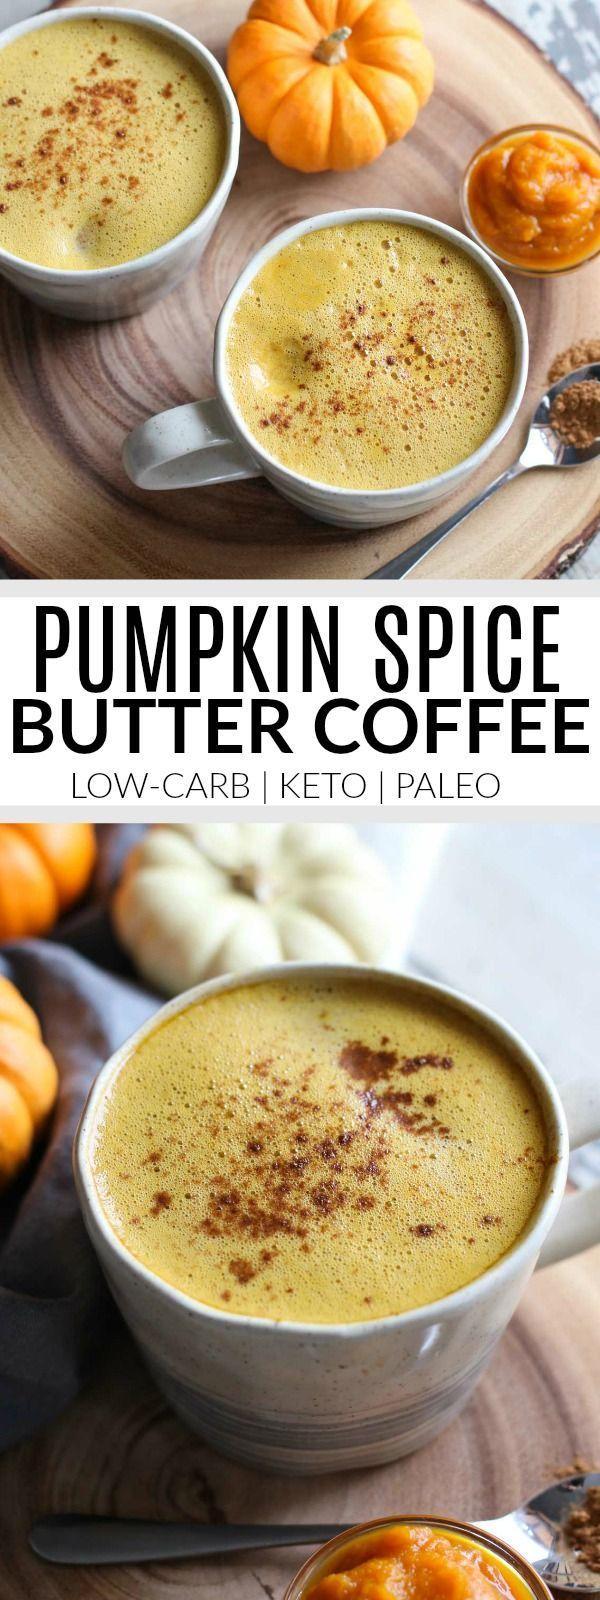 Pumpkin Spice Butter Coffee #pumpkinspiceketocoffee